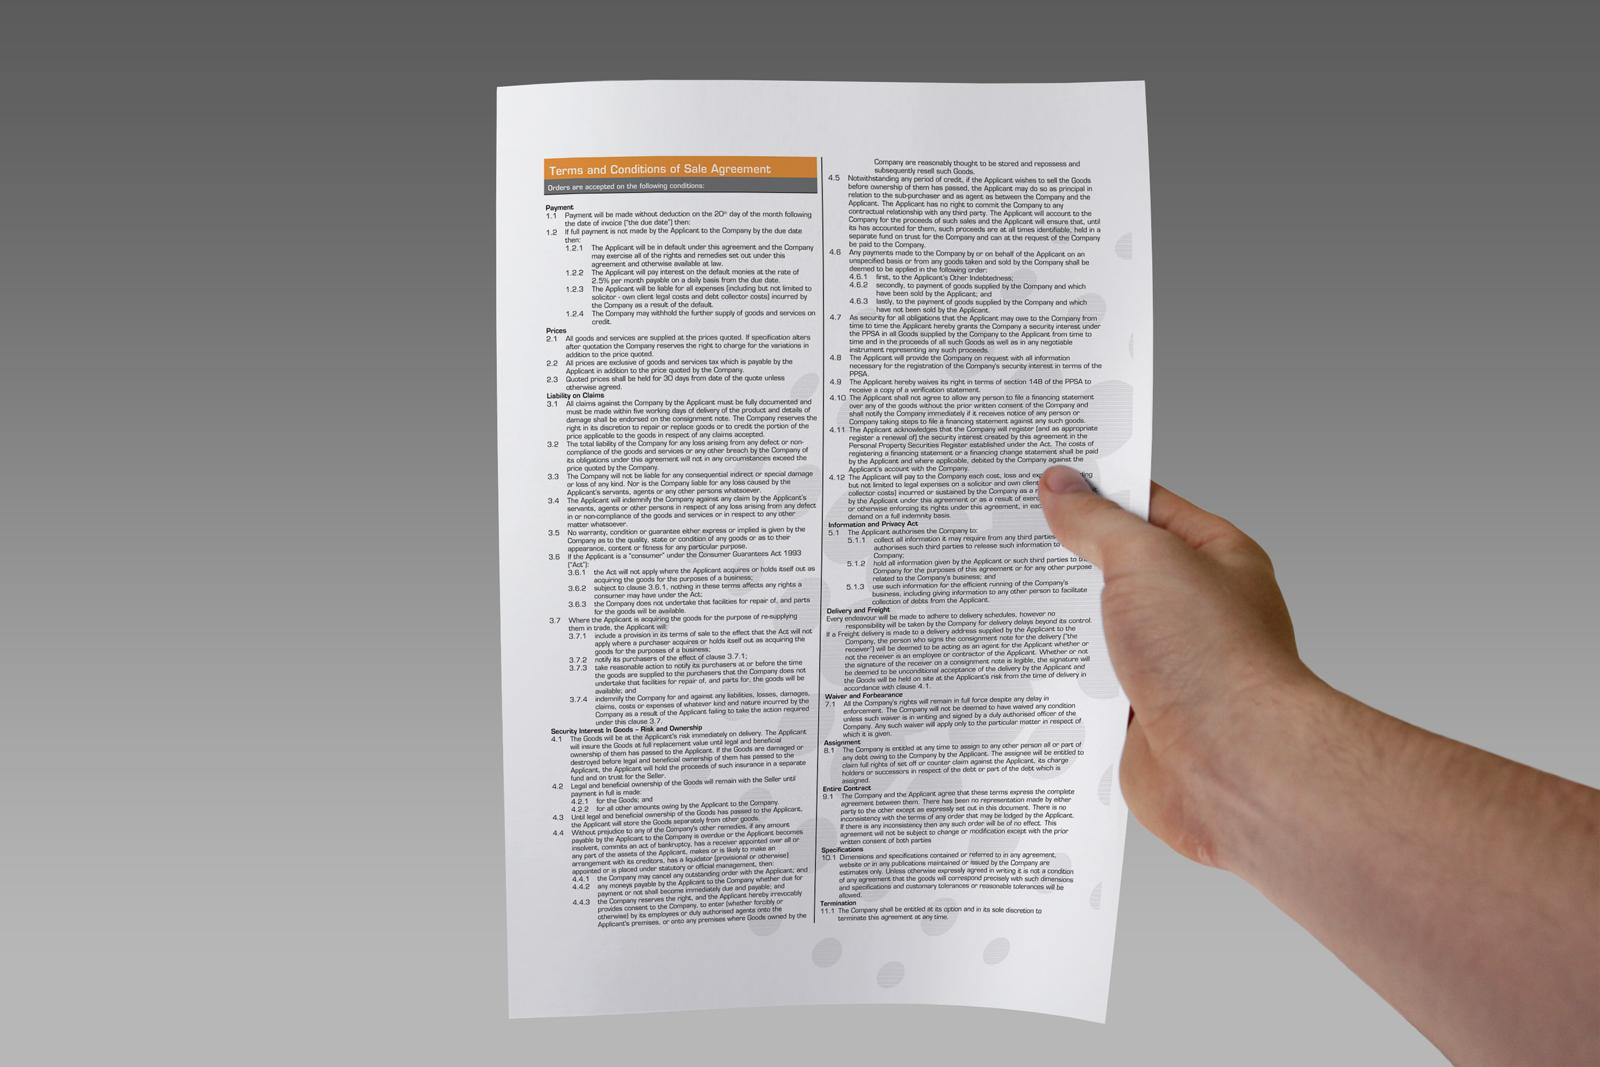 WindsorUrban Custom Microsoft Word Quote Template Document.  Microsoft Word Quote Template